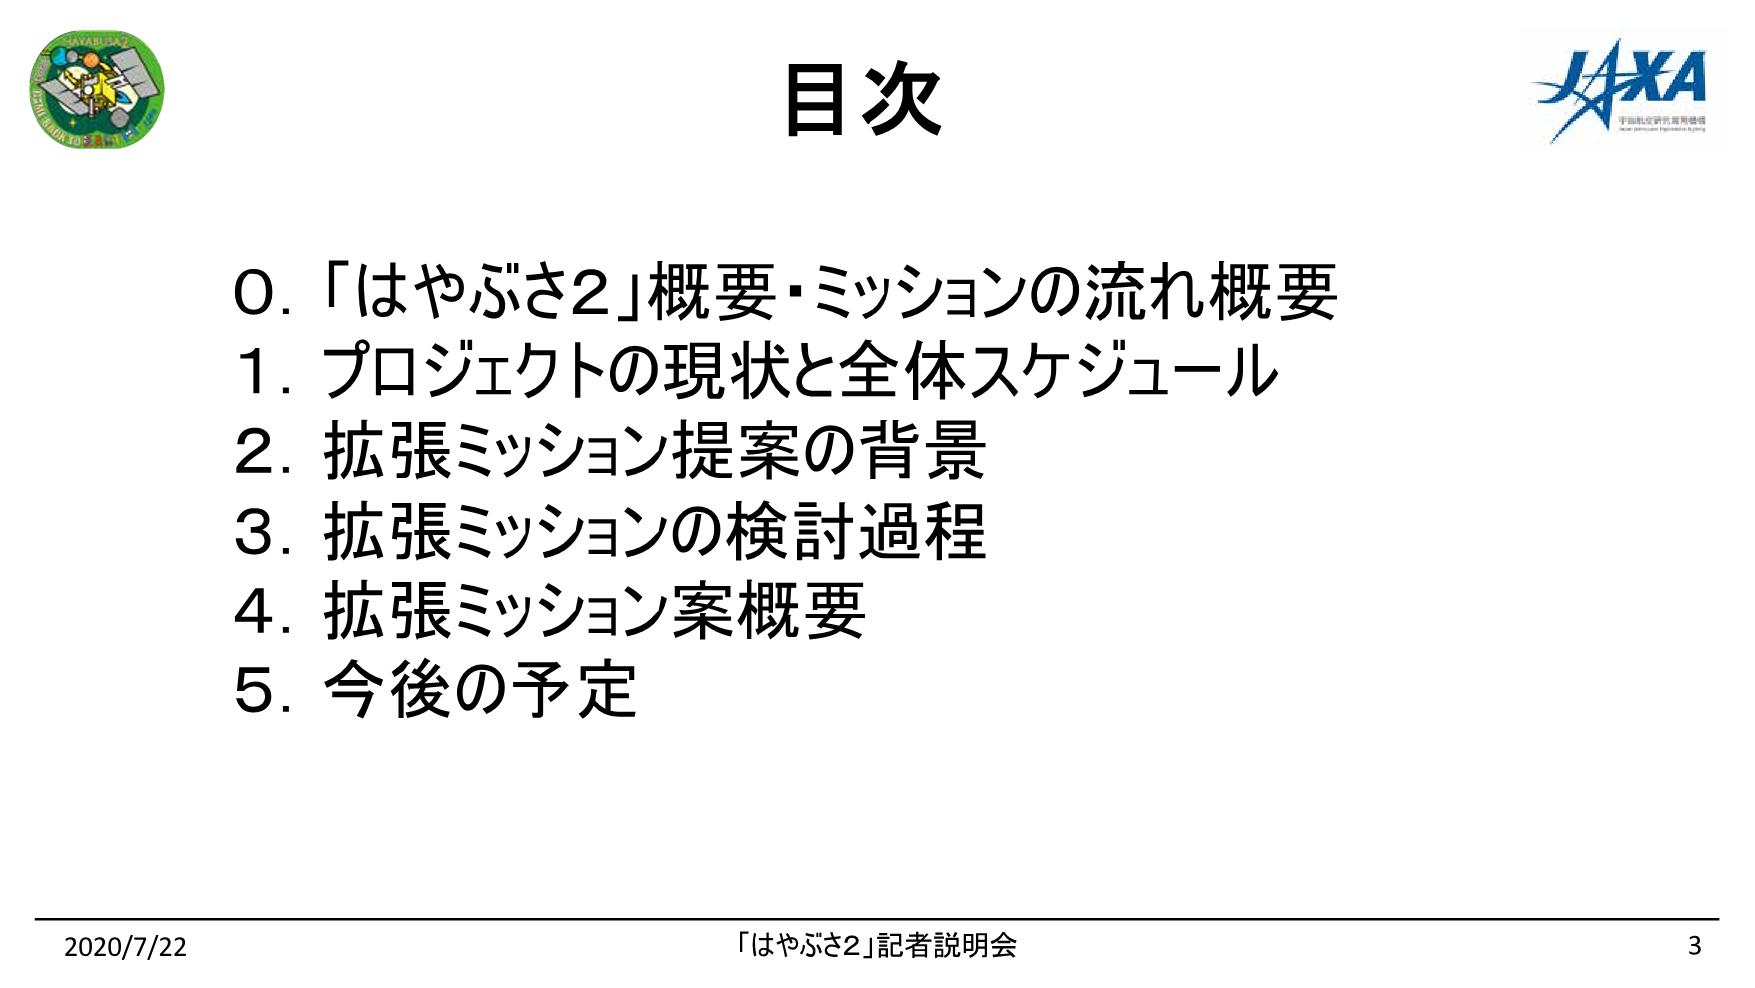 f:id:Imamura:20200722140626p:plain